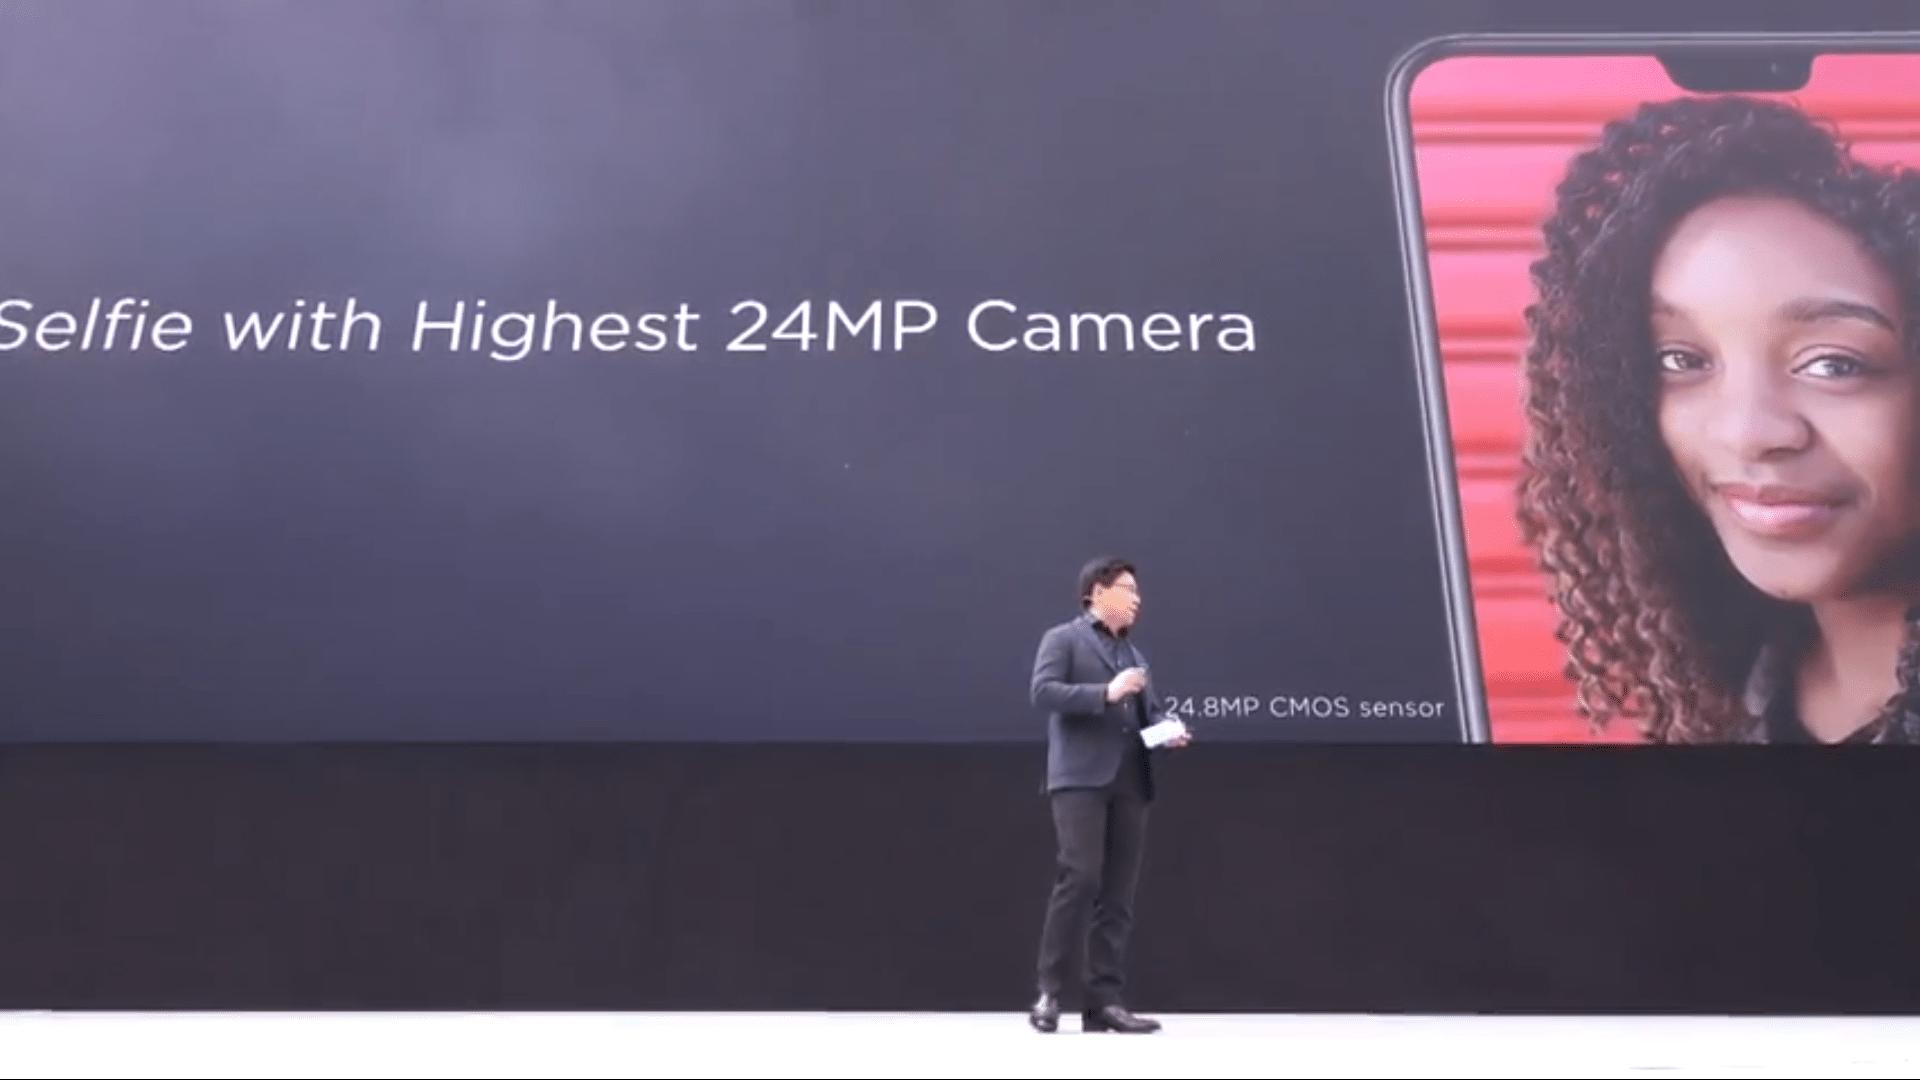 Huawei P20 P20 Pro Selfie Cameras